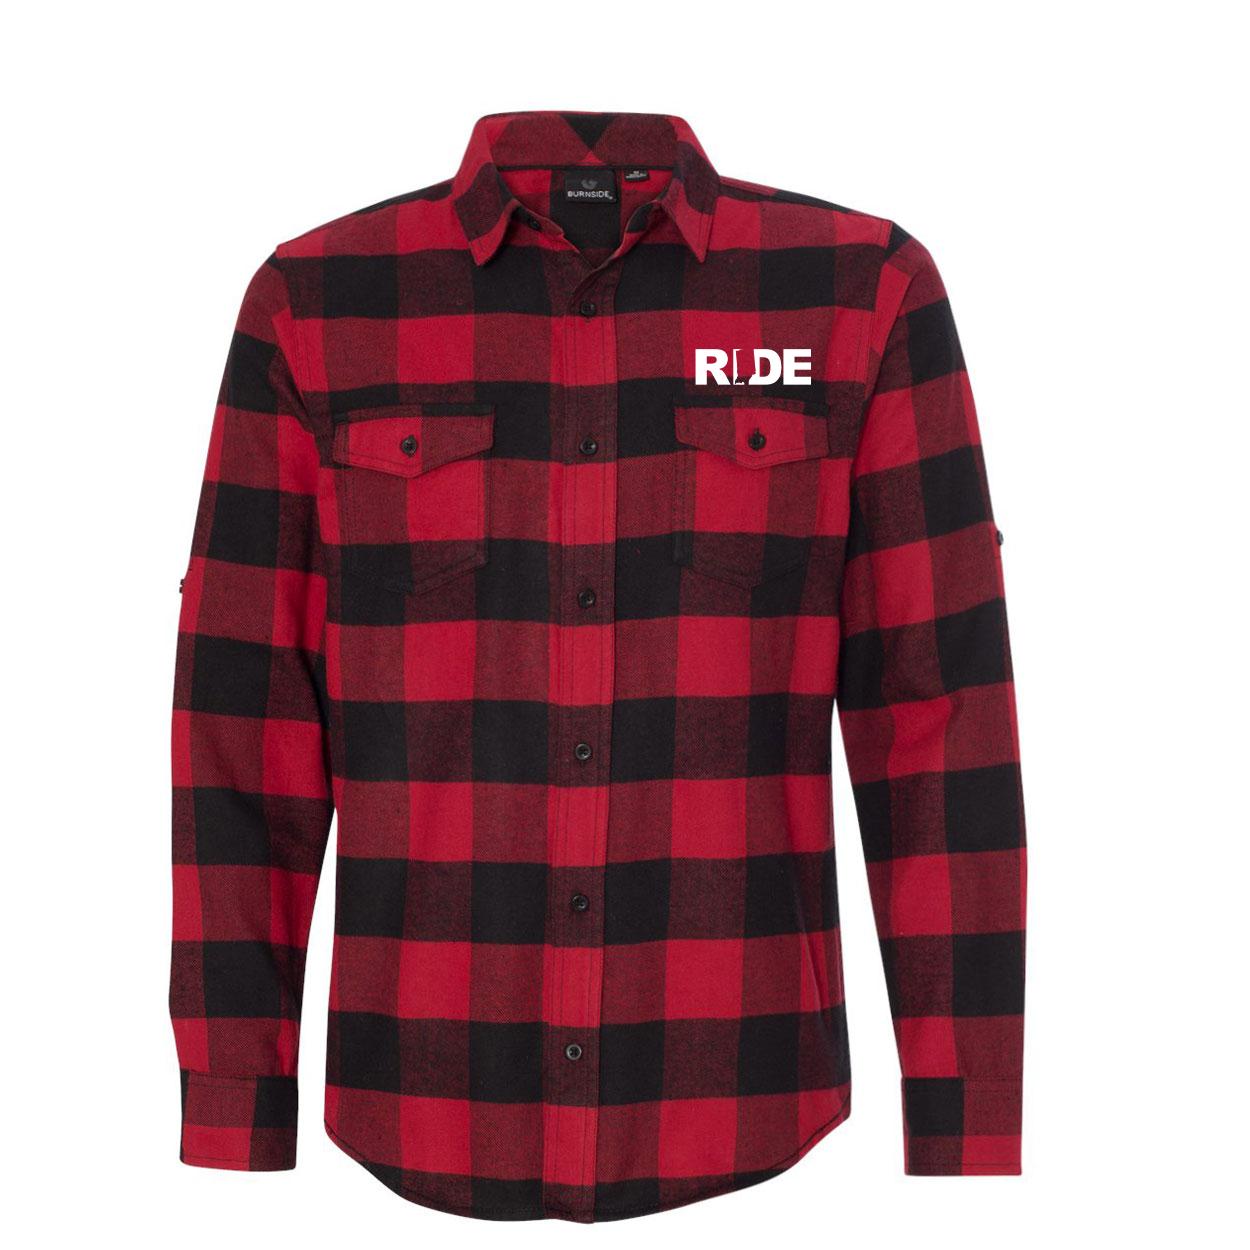 Ride Indiana Classic Unisex Long Sleeve Flannel Shirt Red/Black Buffalo (White Logo)